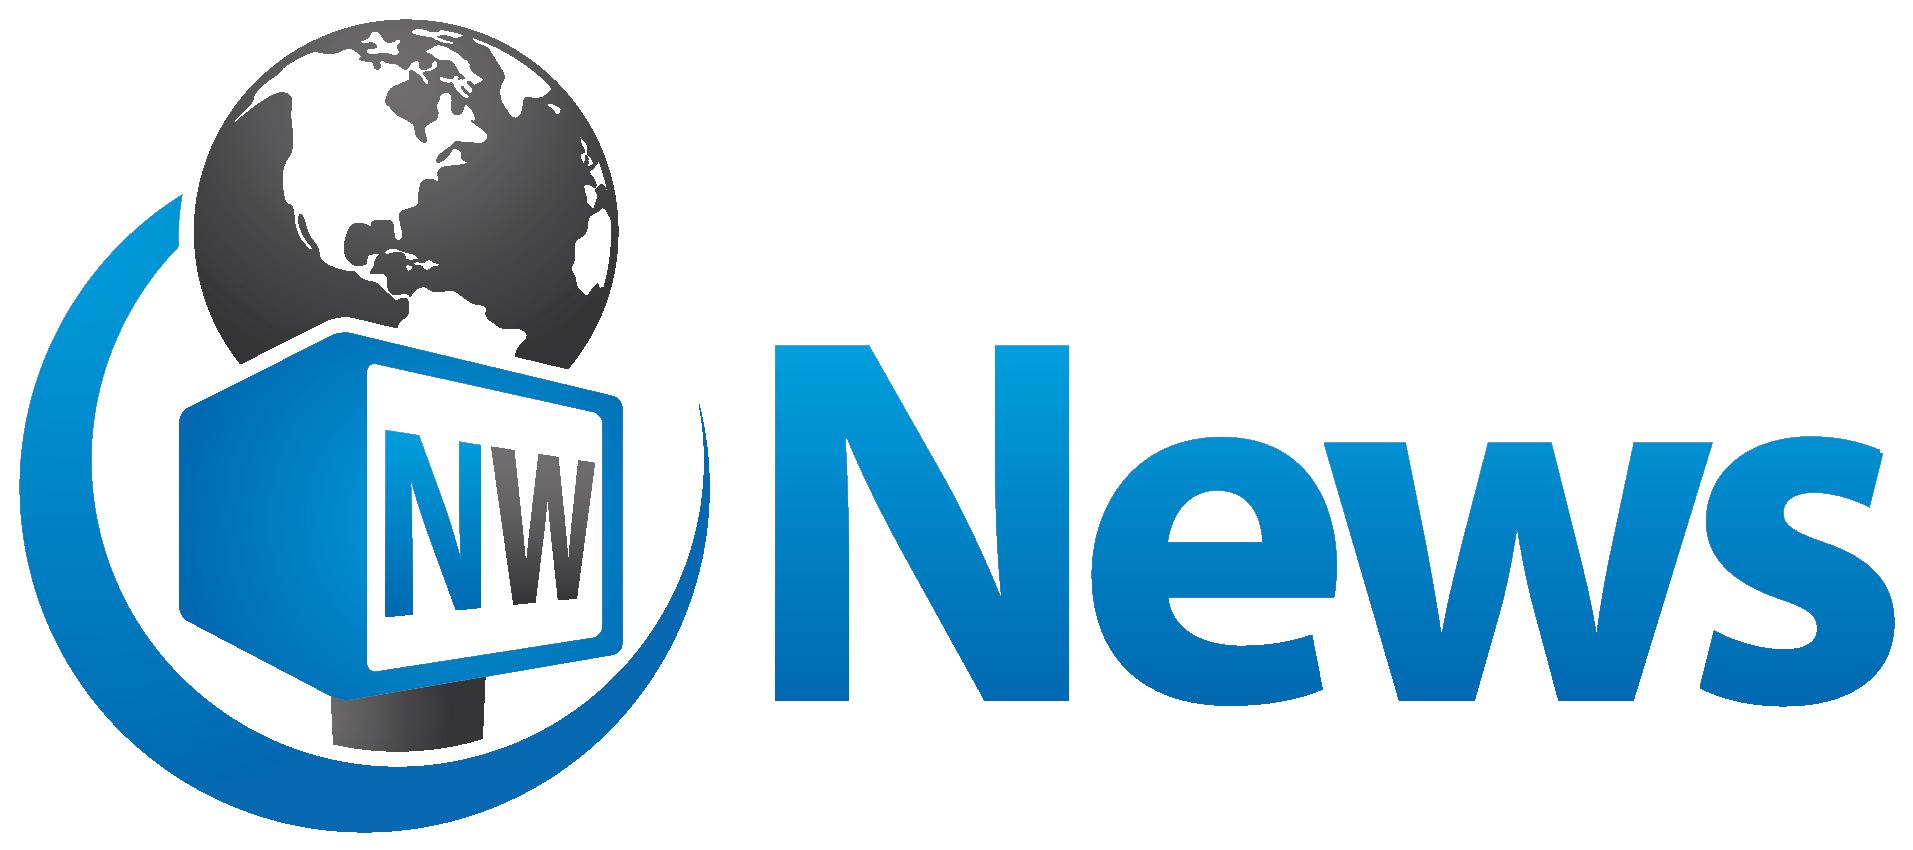 Demo website tin tức của Webdaitin.com